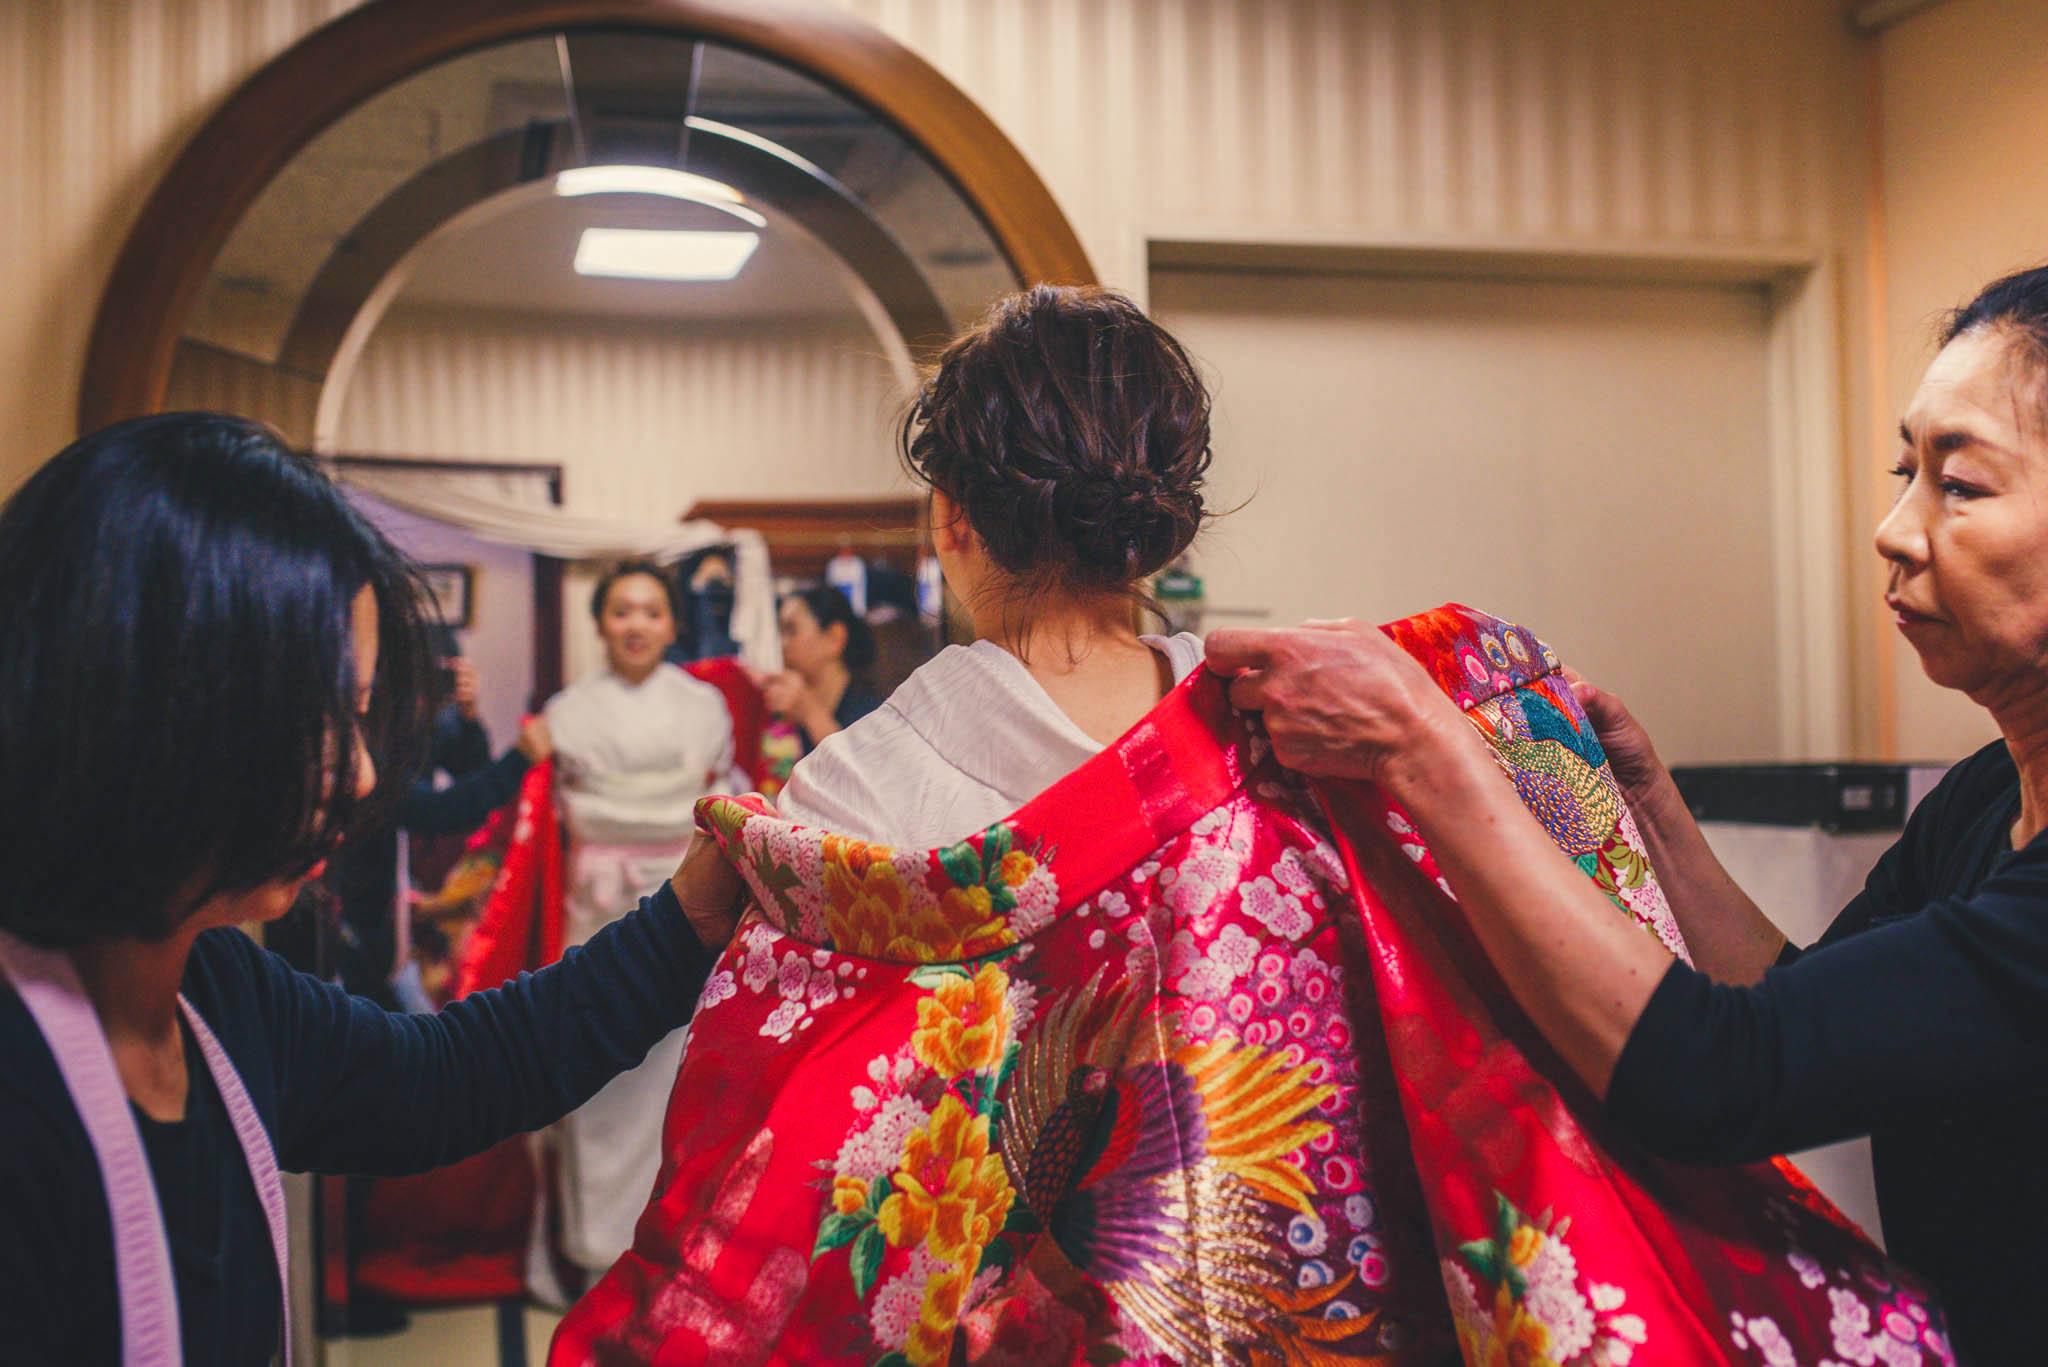 japan-wedding-photography-by-roberto-panciatici-photography-10